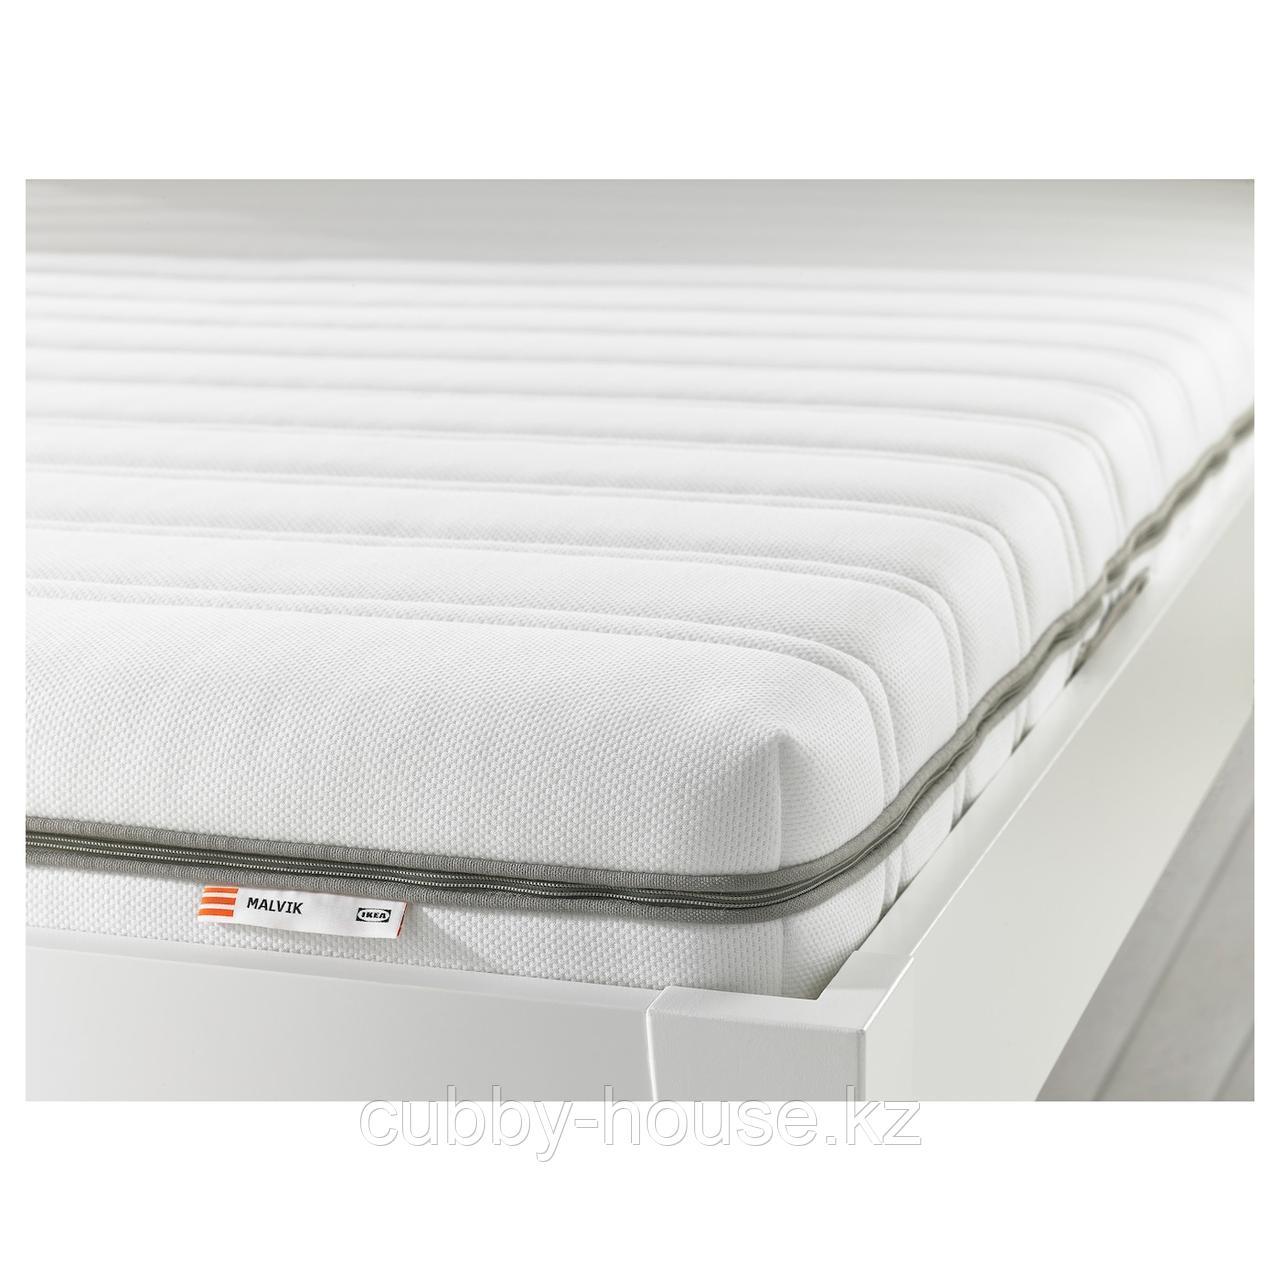 МАЛВИК Пенополиуретановый матрас, жесткий, белый, 90x200 см